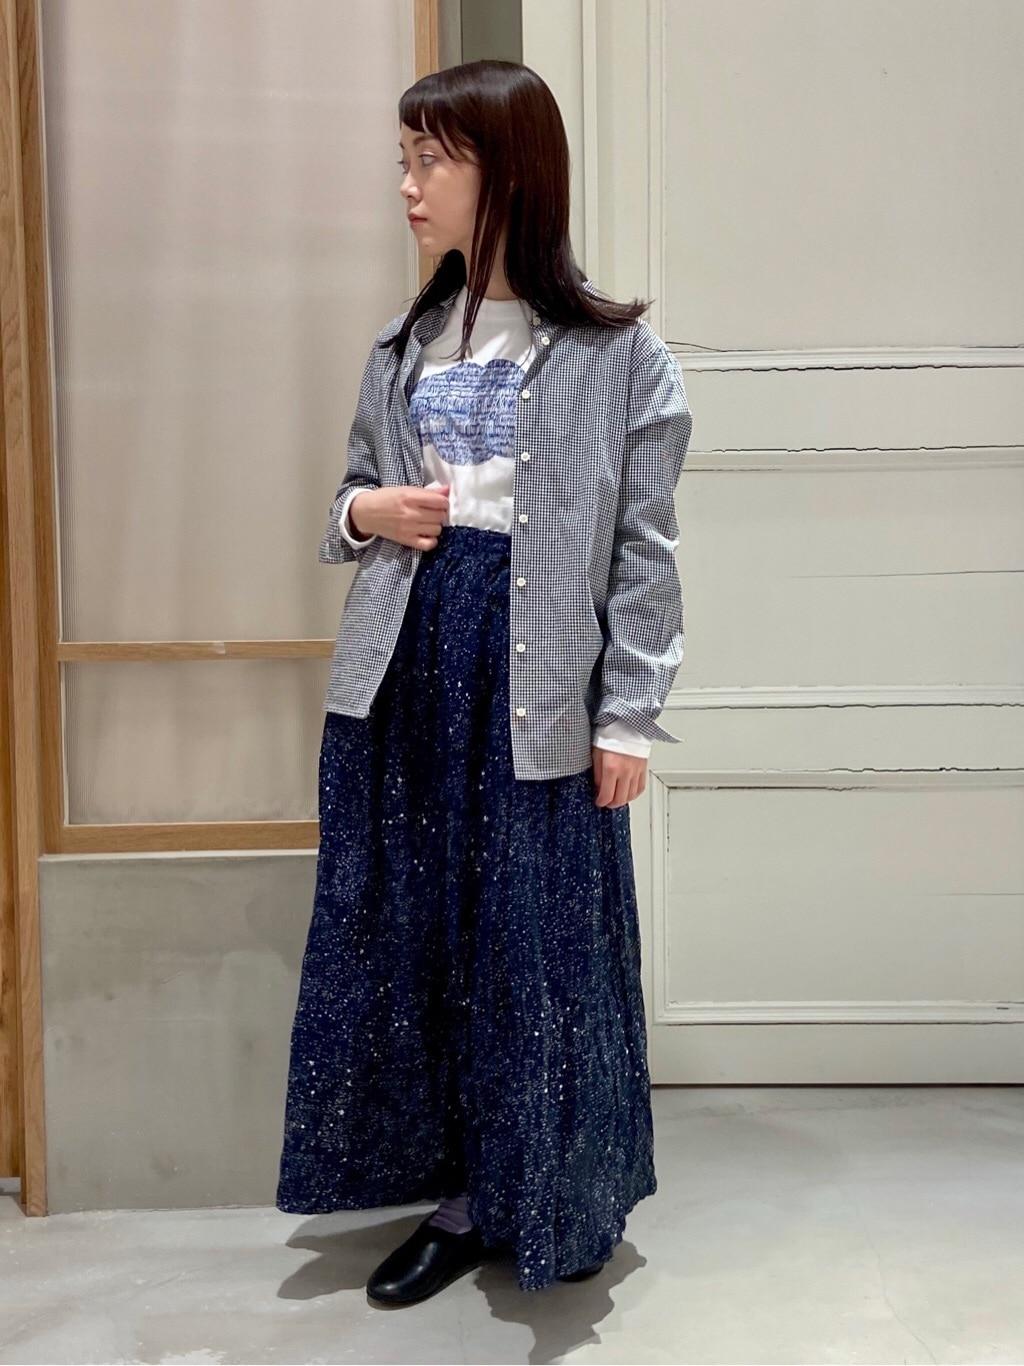 bulle de savon 渋谷スクランブルスクエア 身長:153cm 2021.01.27